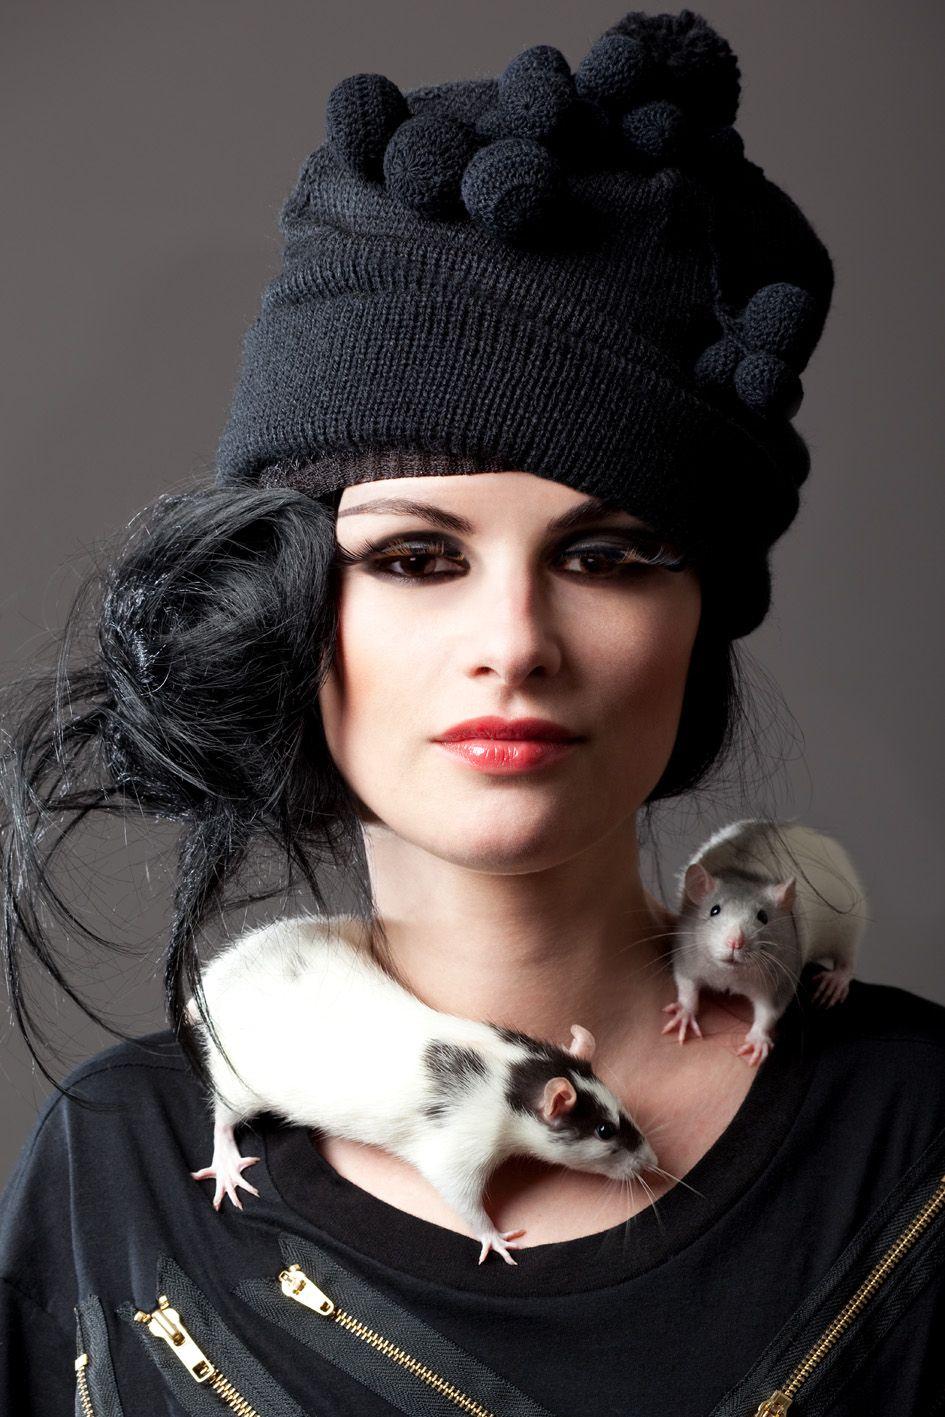 Karine Marsac for Shue Uemura (I like black and rats)